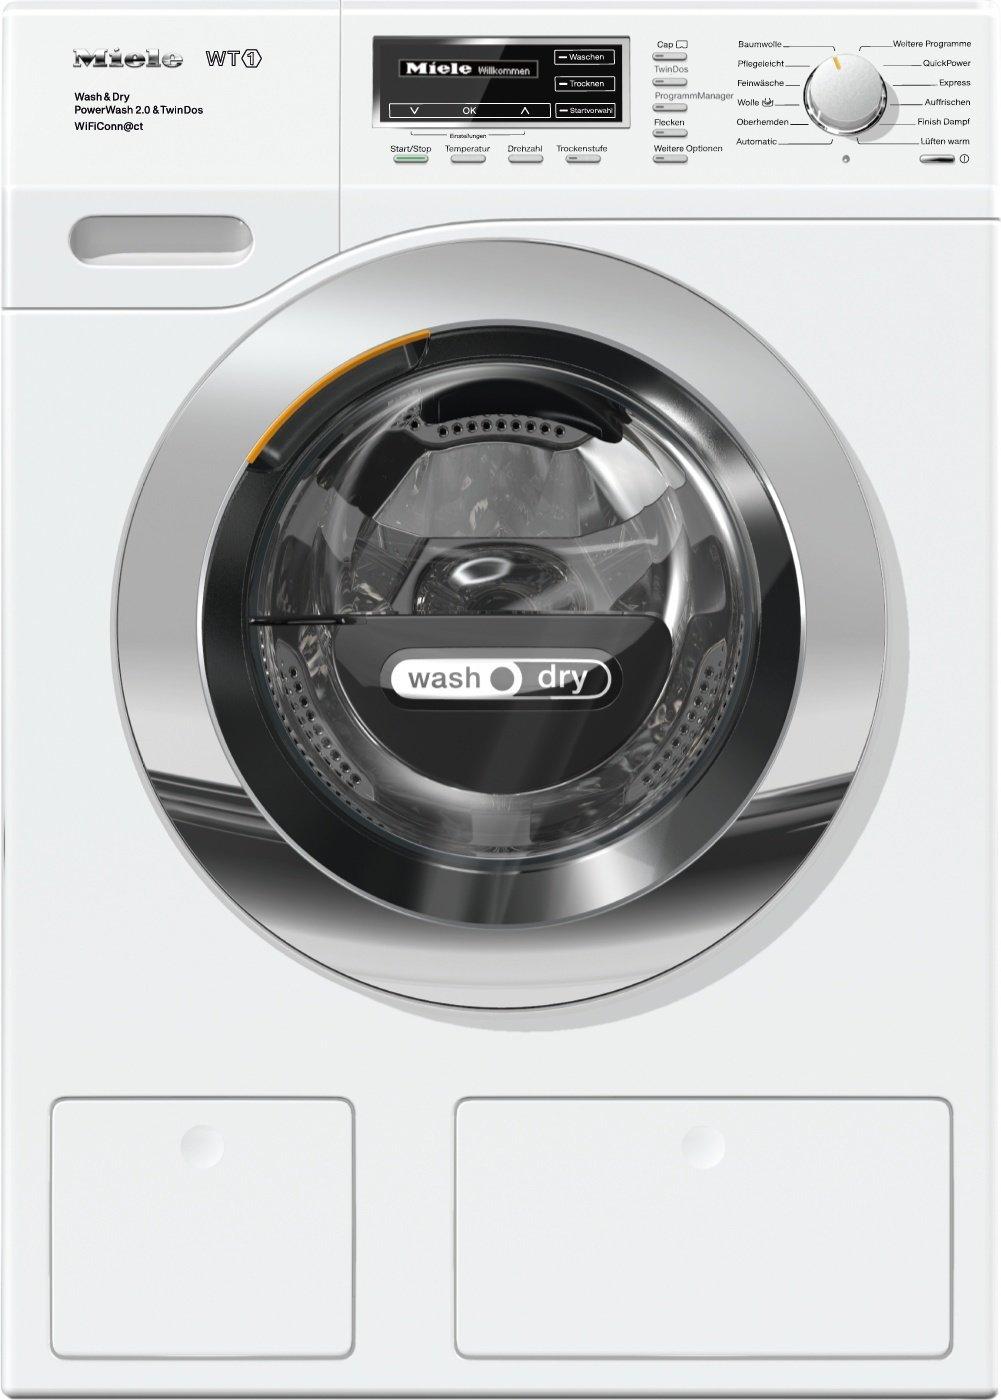 Miele-WTH730WPM-PWash-20-und-TwinDos-WiFi-WT1